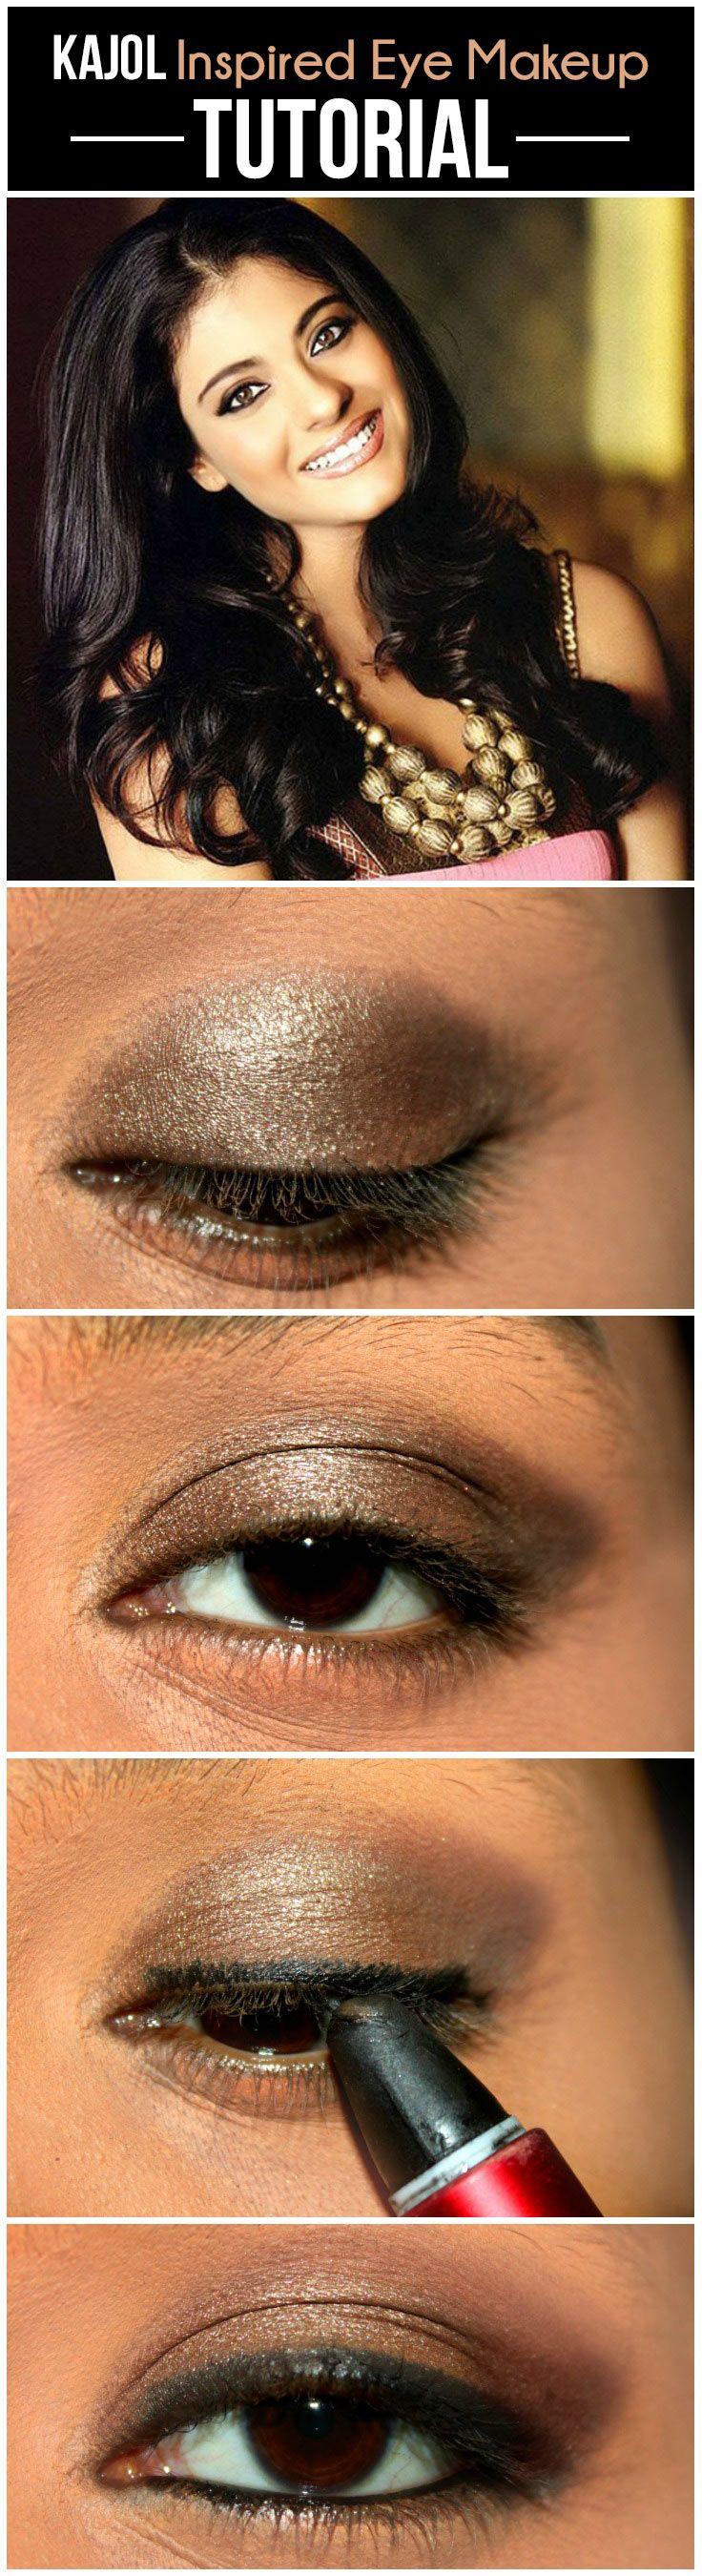 bollywood eye makeup tutorial